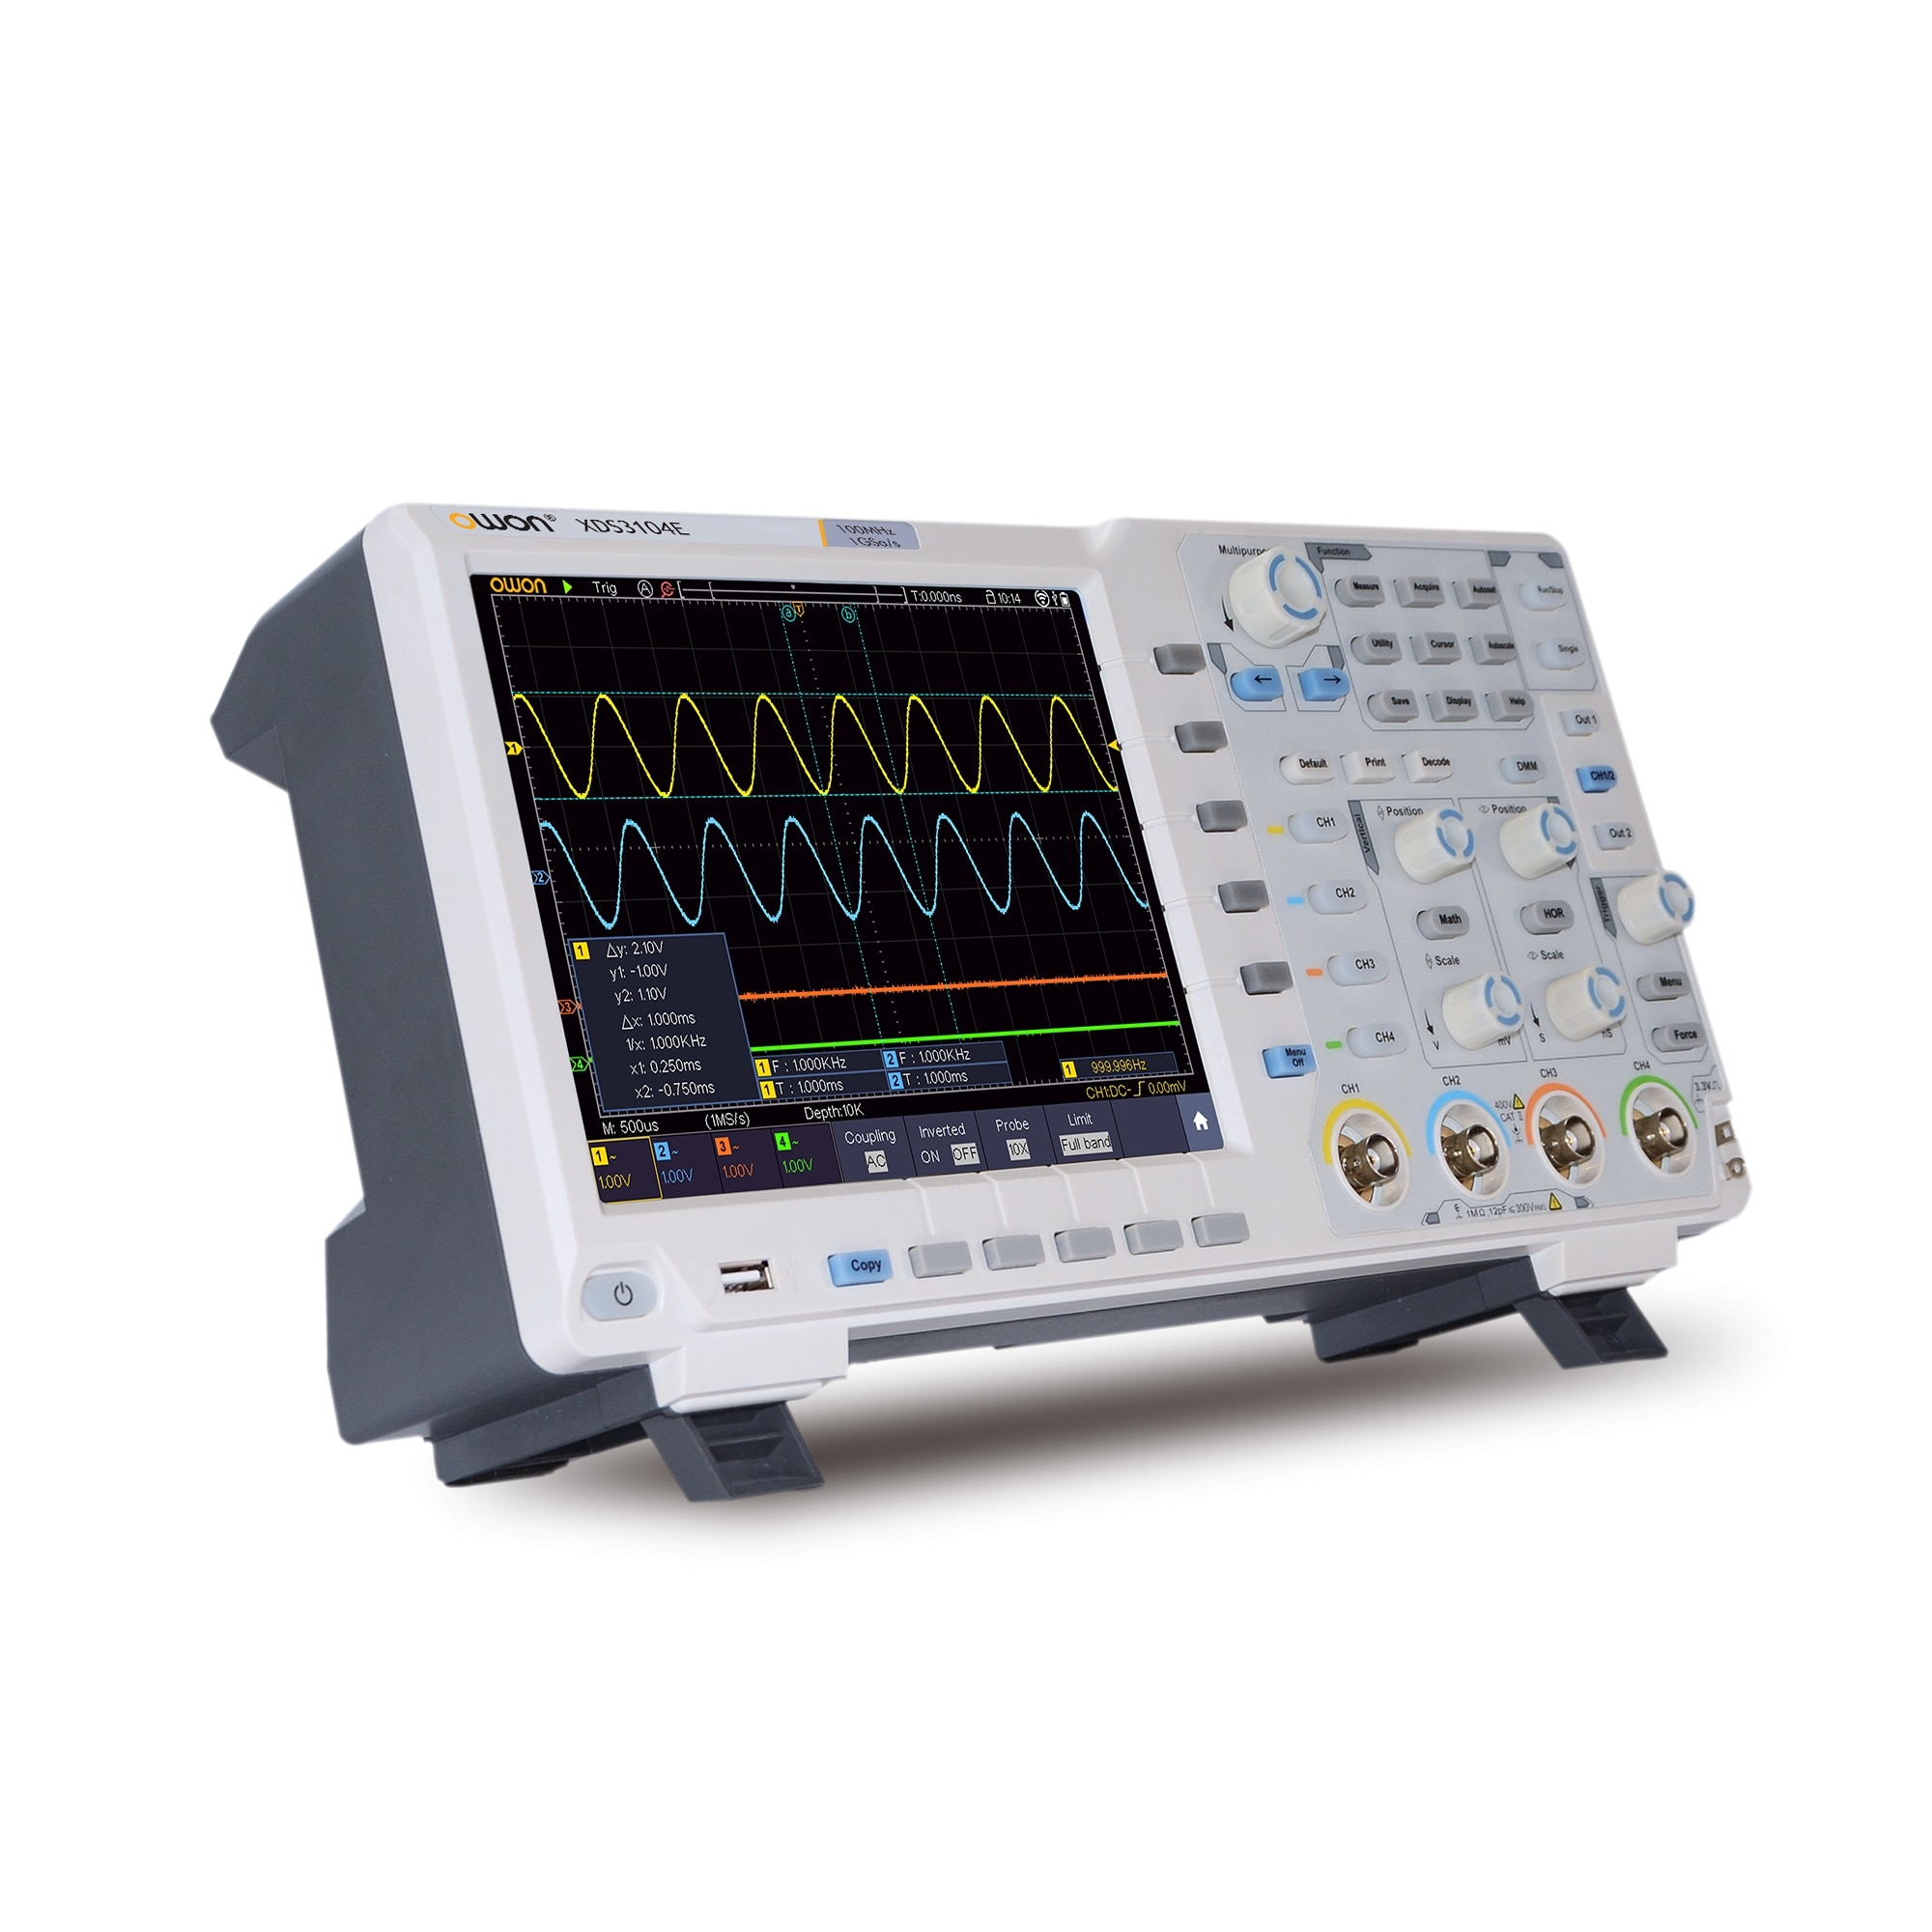 Owon xds3064ae/xds3104ae/xds3204ae/xds3064e/xds3104e/xds3202e/xds3204e osciloscópio